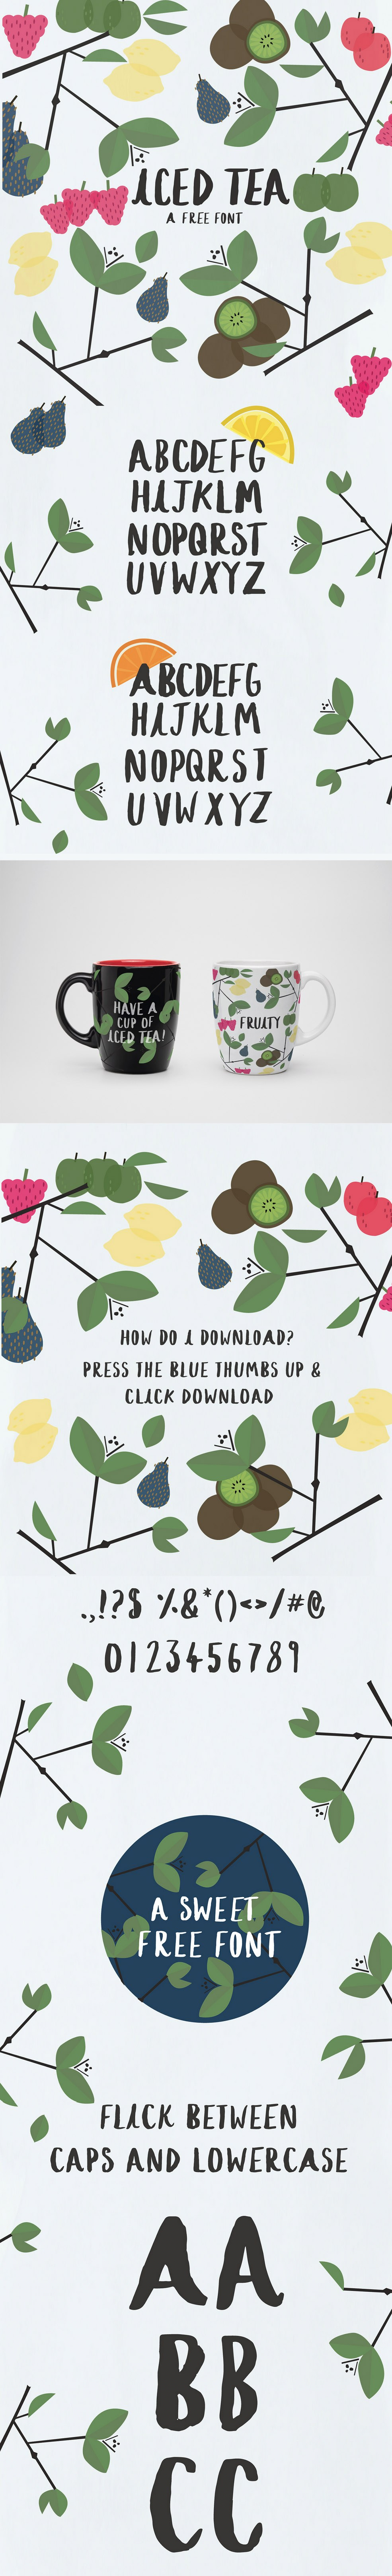 https://fontclarity.com/wp-content/uploads/2019/09/iced-tea-download-0.jpg Free Download